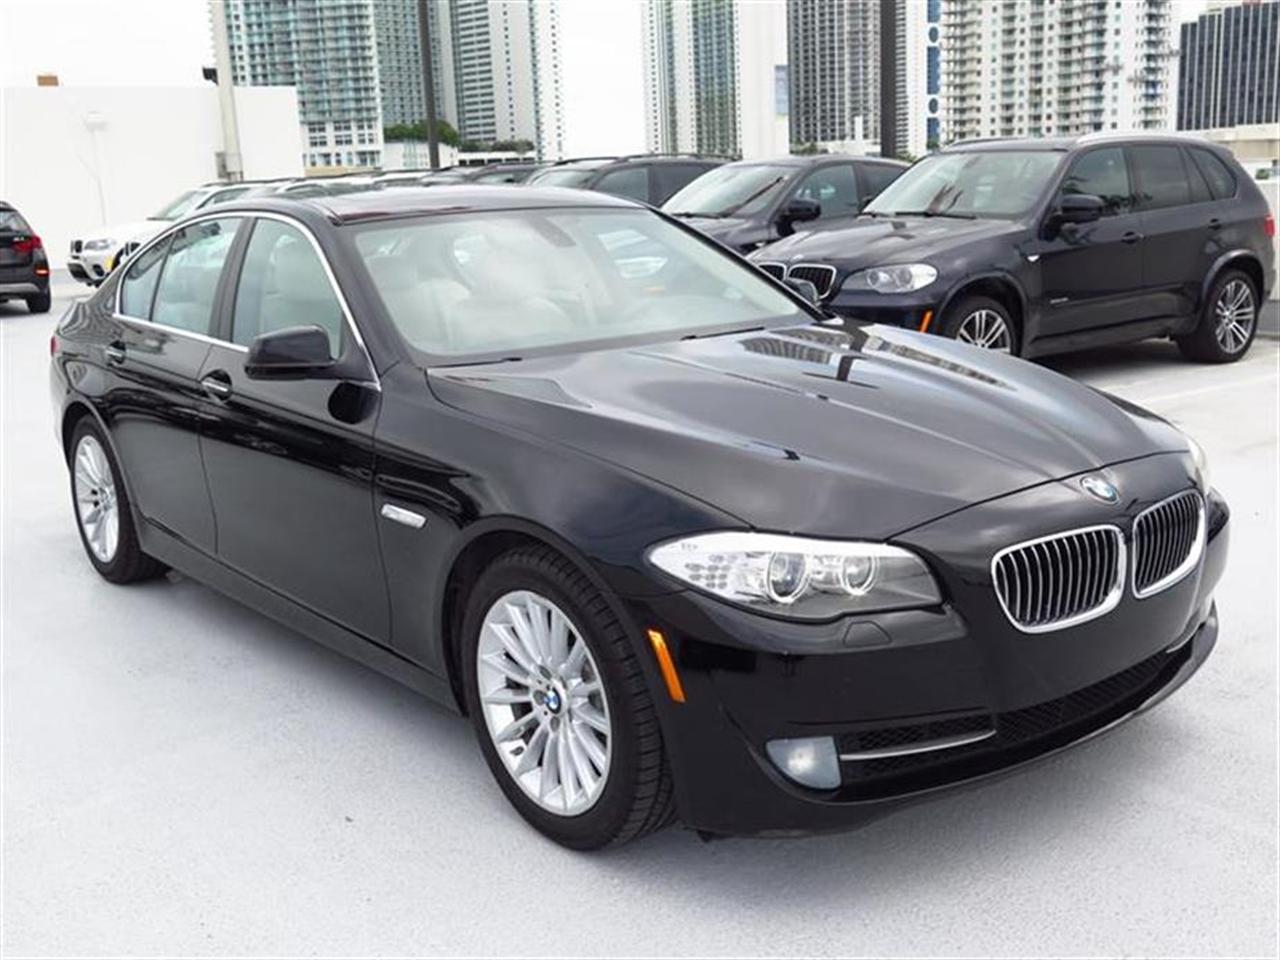 2012 BMW 5 SERIES 4dr Sdn 535i RWD 34287 miles 10-way power-adjustable front bucket seats -inc 4